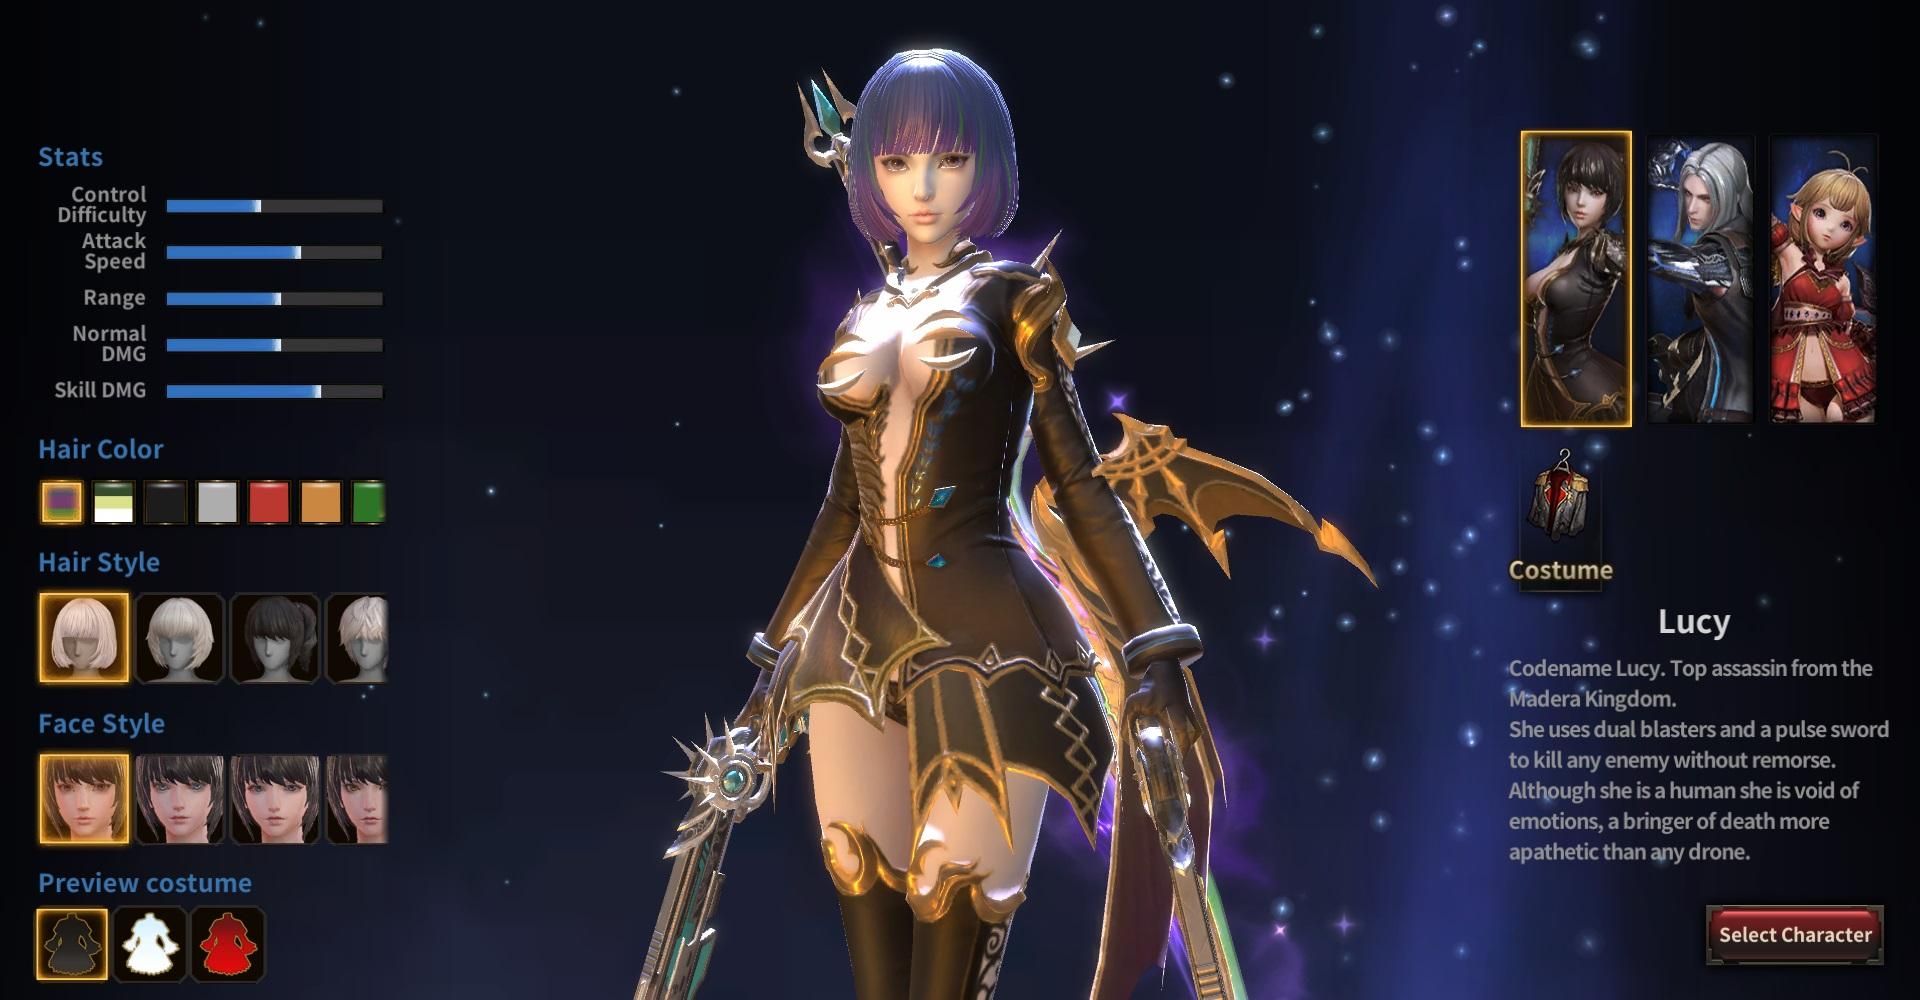 3D Hentai Game Video foxynite 3d hentai game nutaku screenshot 5 - hentai reviews